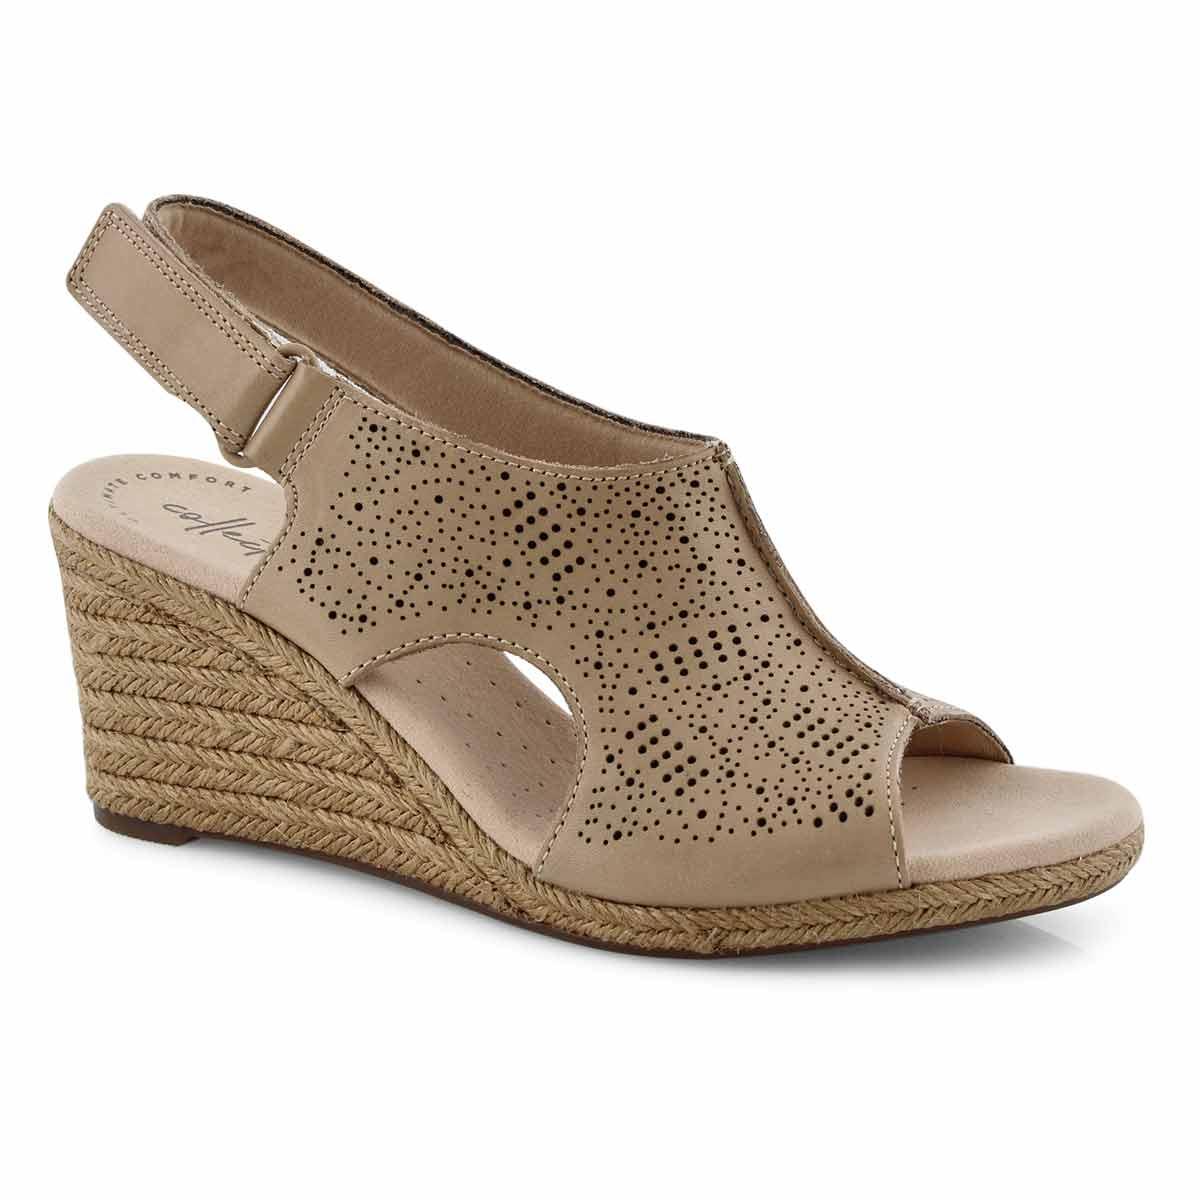 c43bfefacc0 Women's LAFLEY ROSEN sand wedge sandals